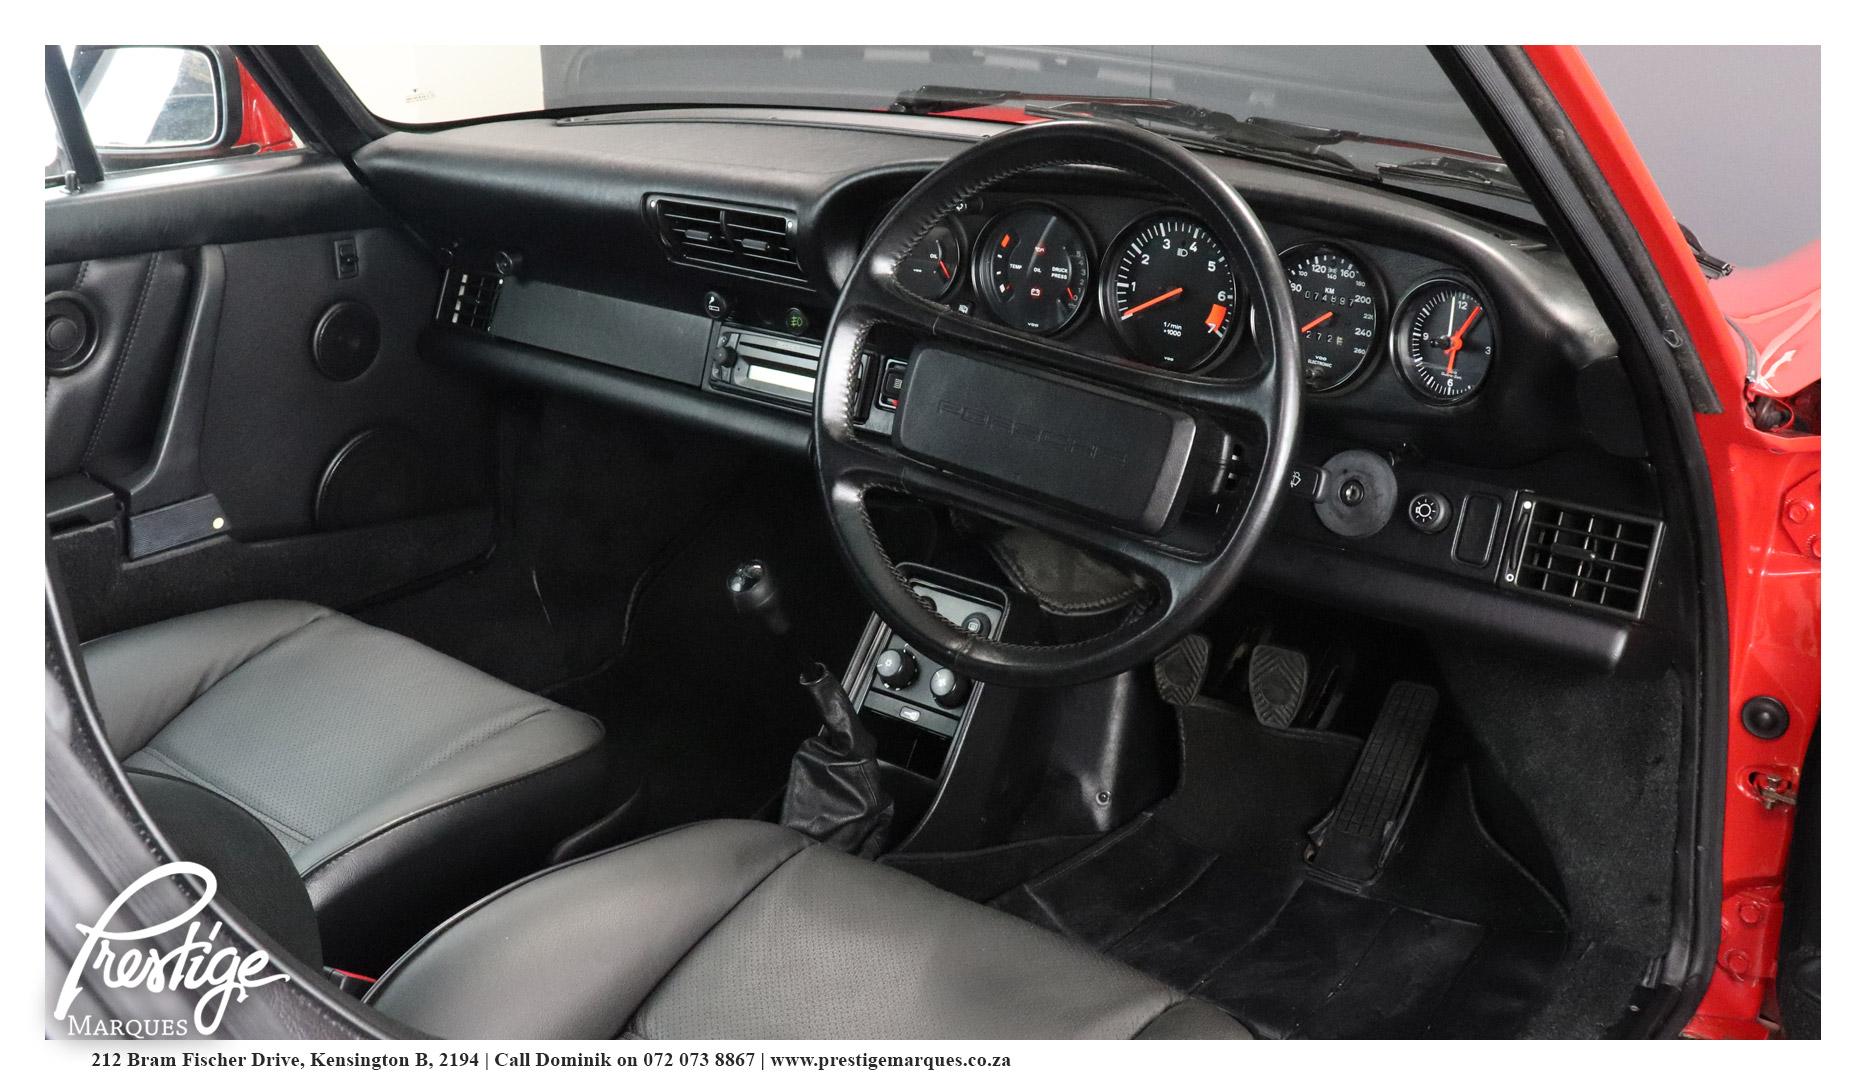 1989-Porsche-911-Carerra-3.2-350-Prestige-Marques-Randburg-Sandton-12